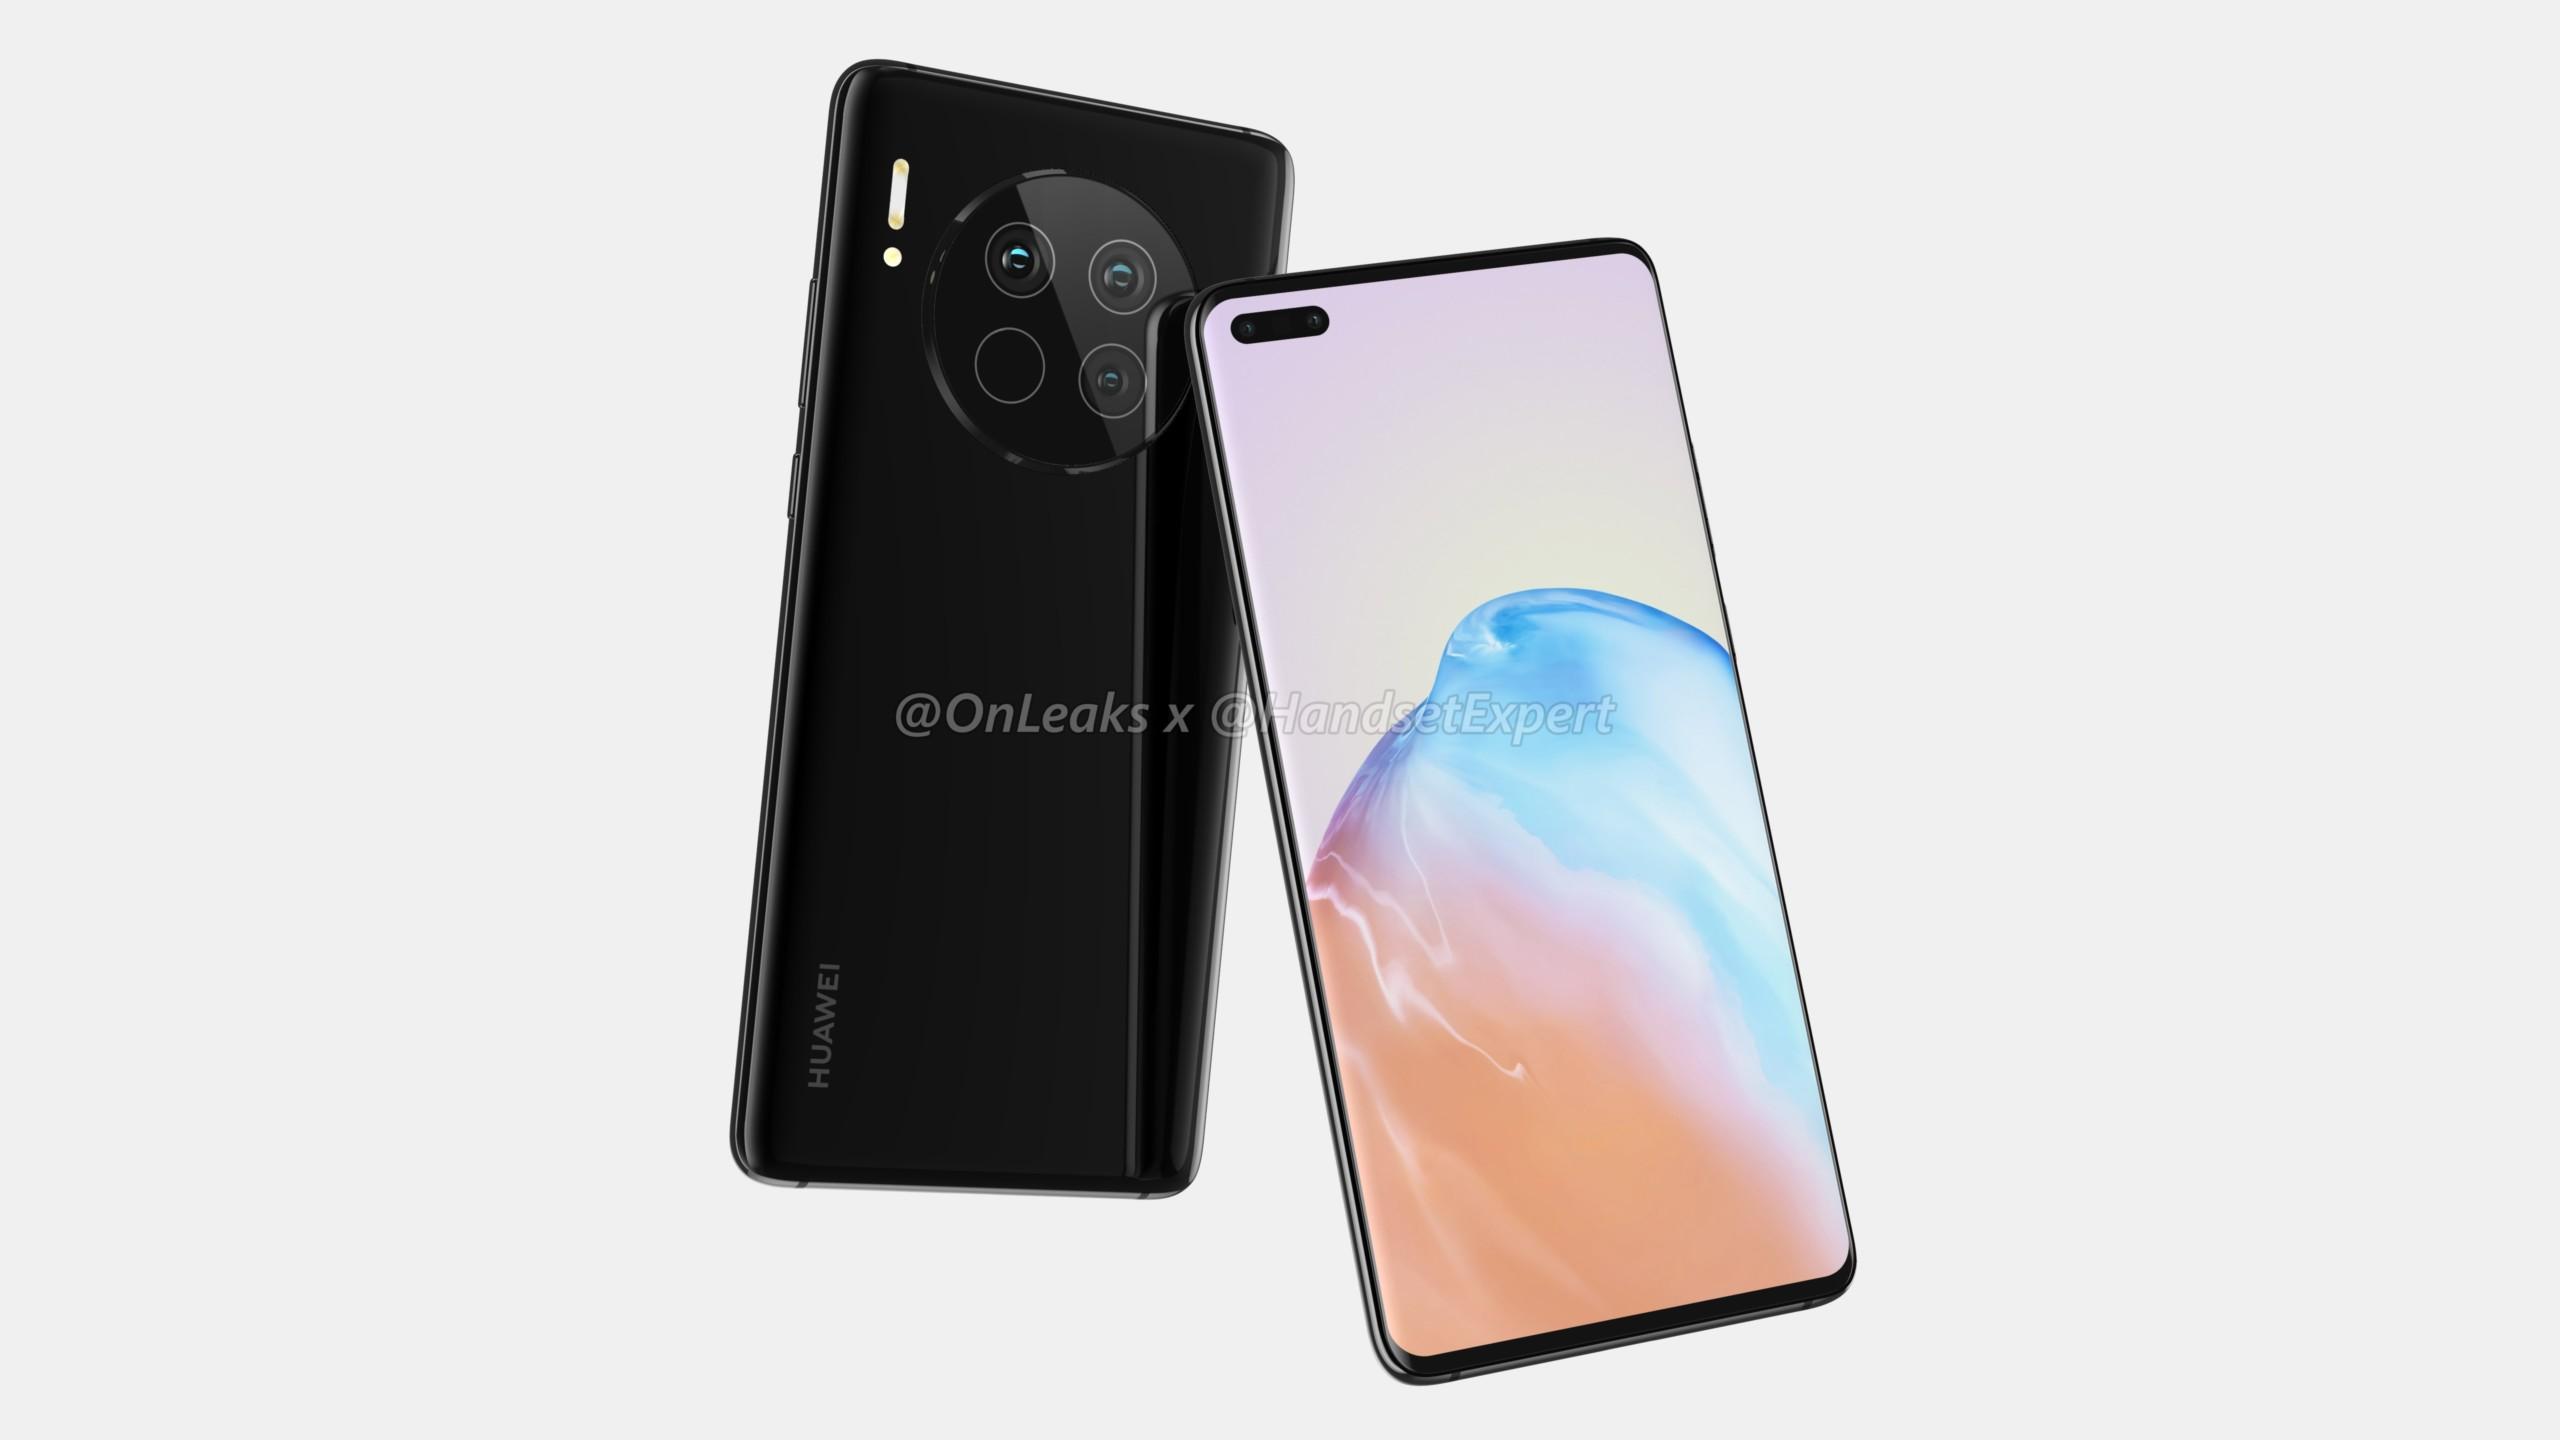 Le Huawei Mate 40 serait le dernier smartphone avec processeur Kirin